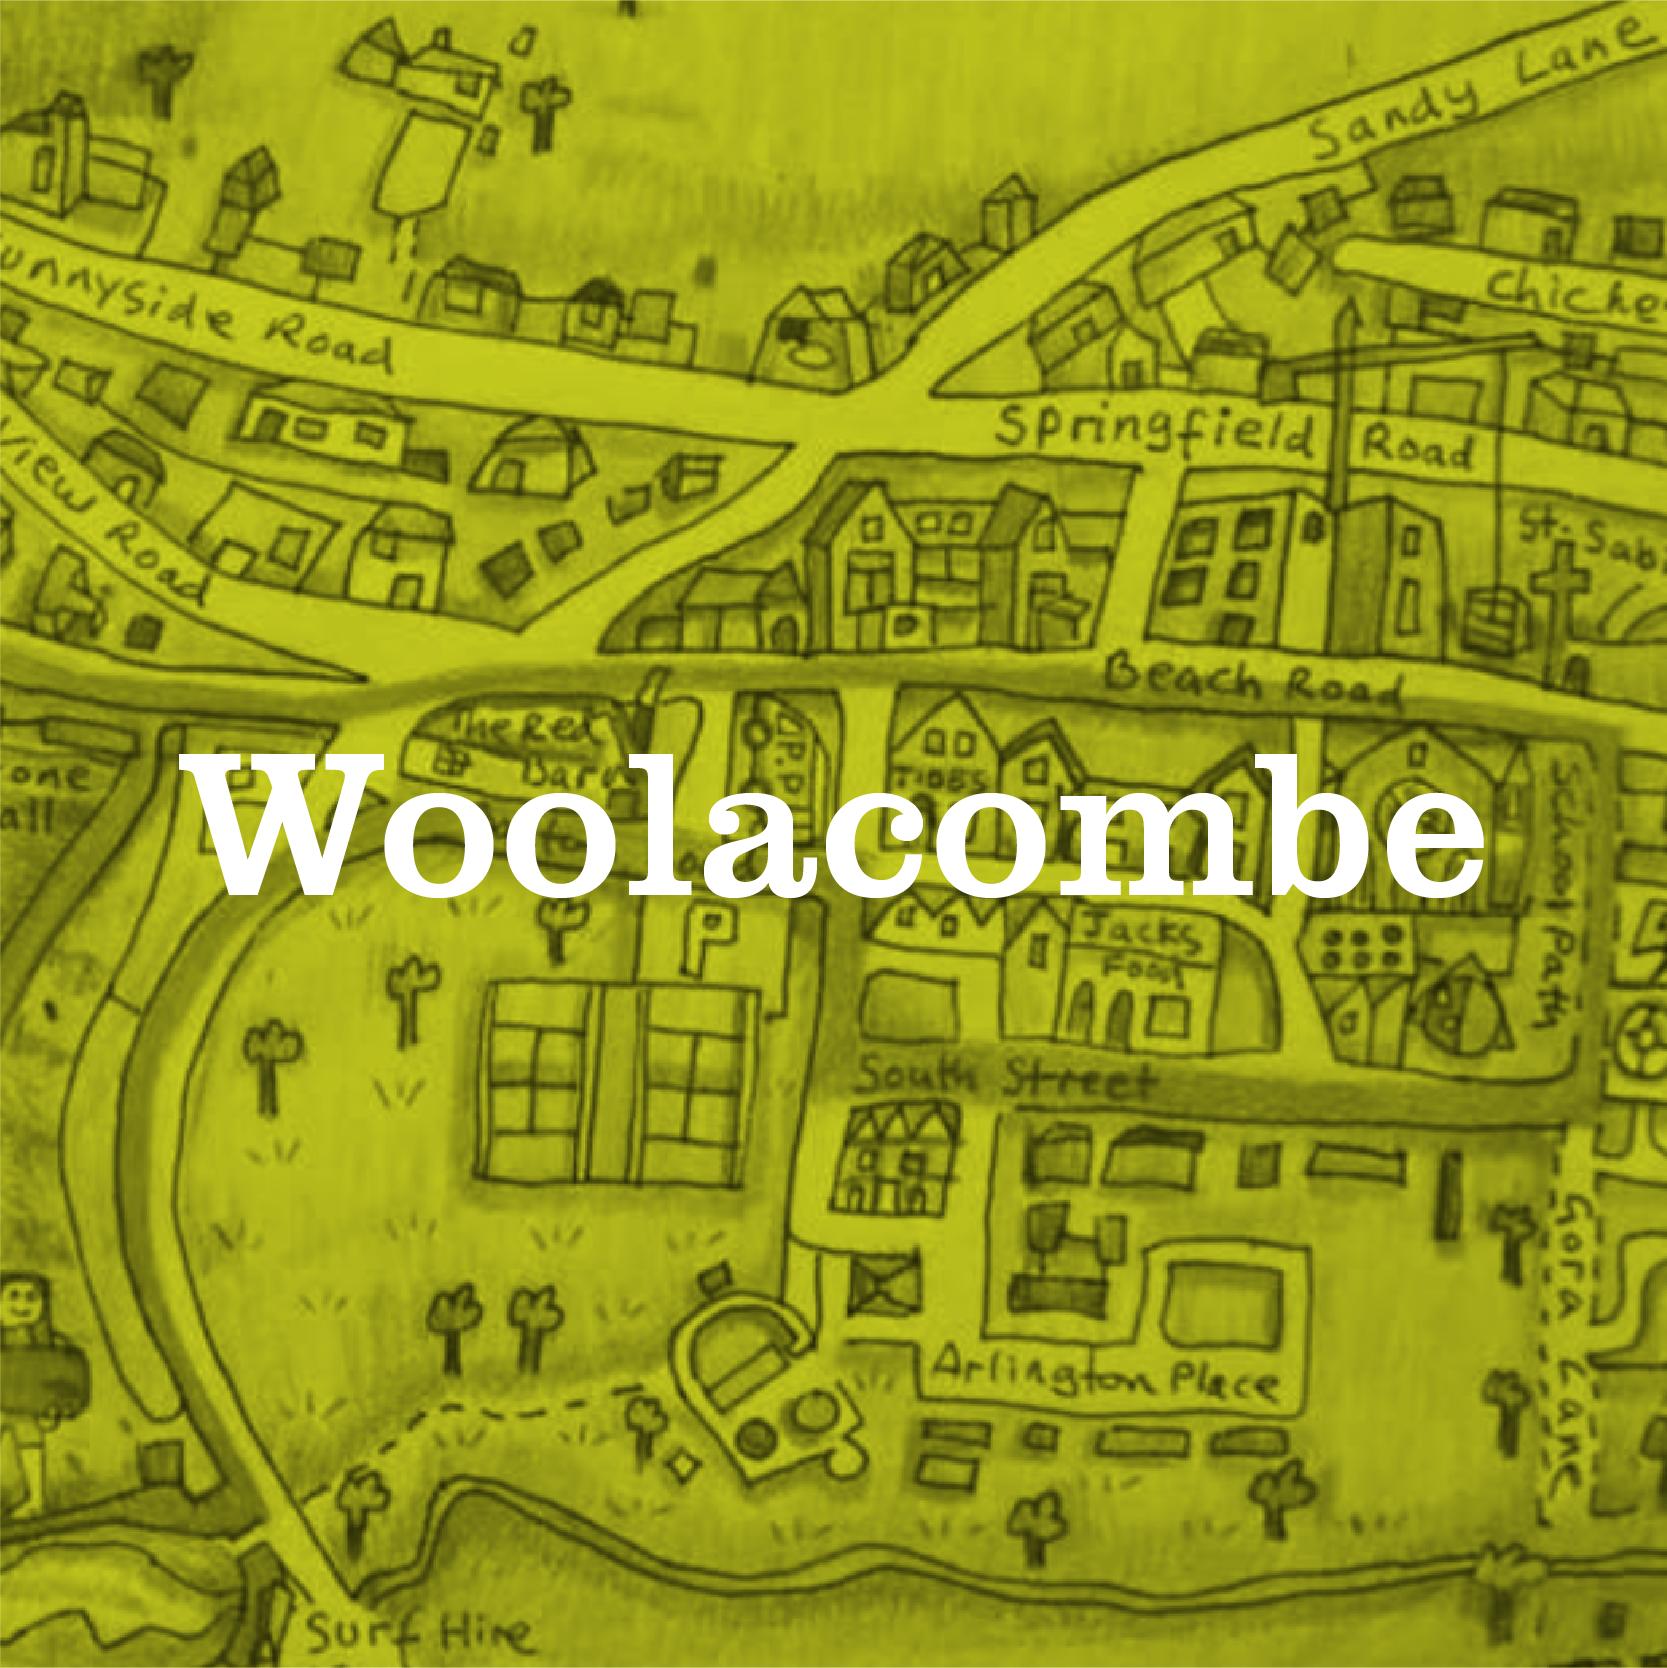 Beaford, Community Trails, Woolacombe